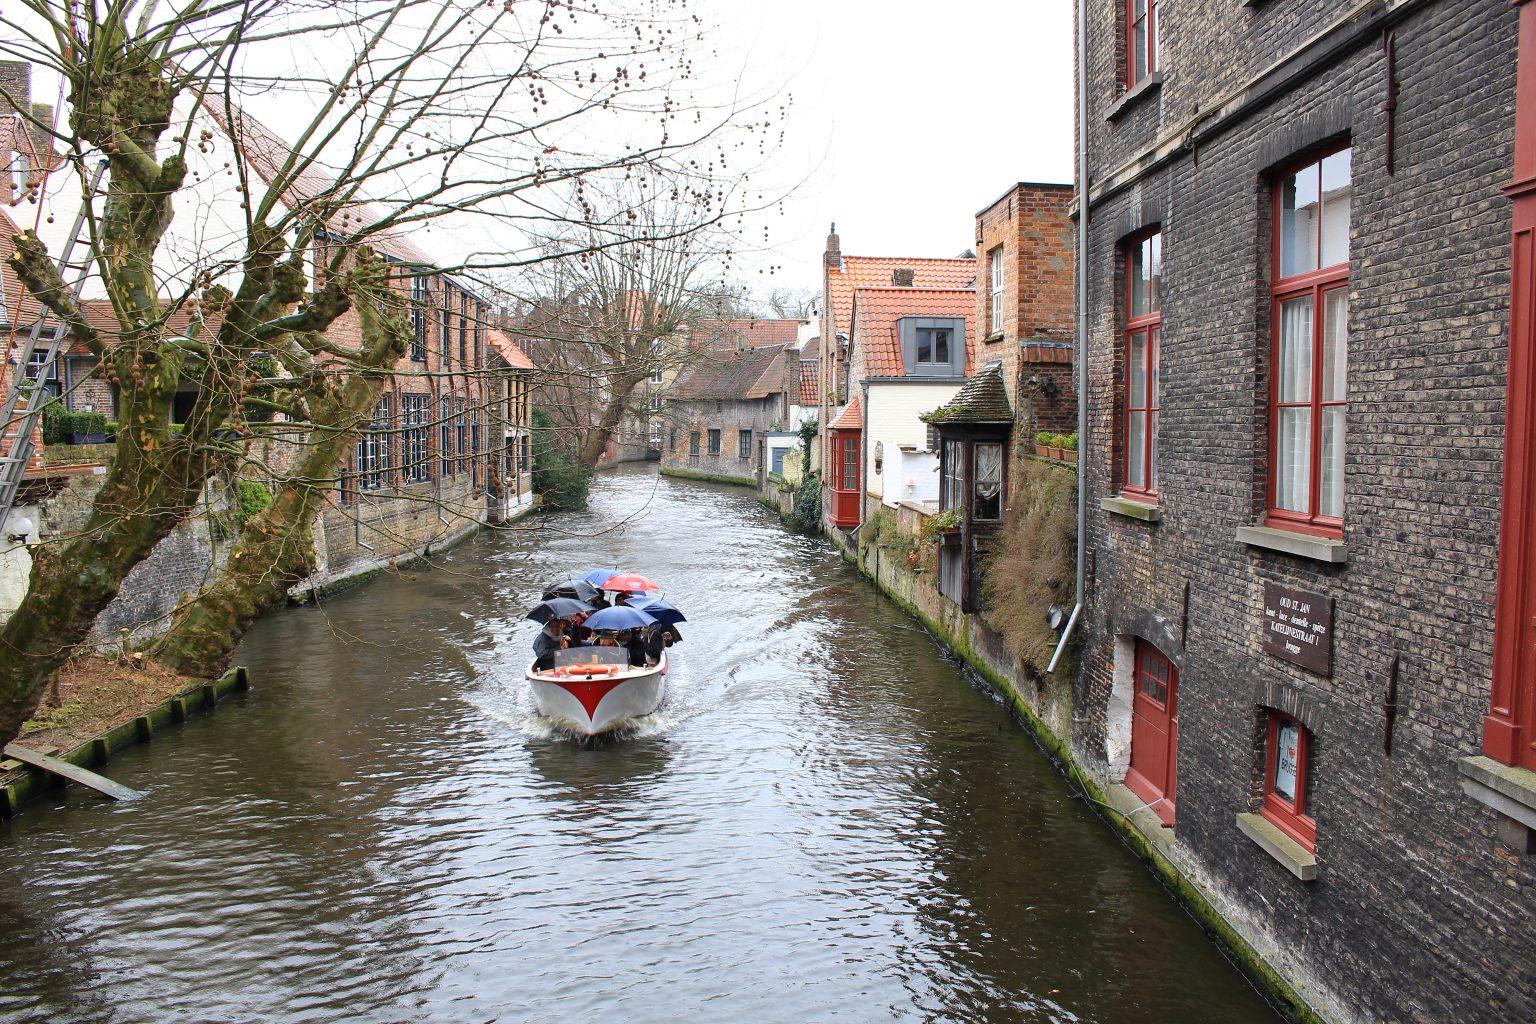 Bruges Belgium river cruise, bruges walking tour, brugge city tour